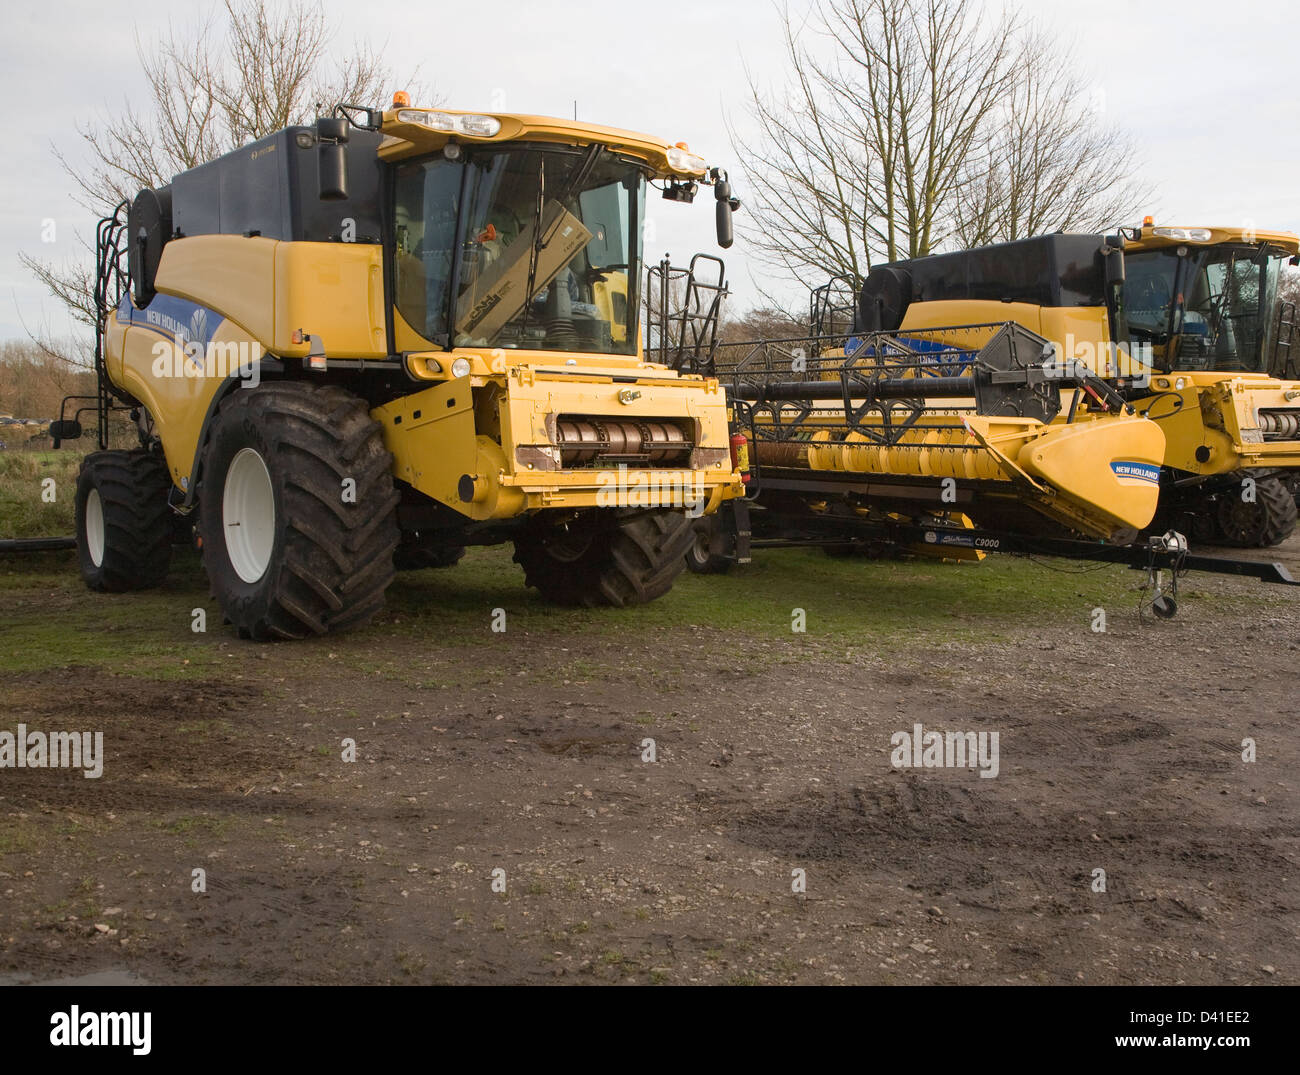 New Holland CR range combine harvester machines, Suffolk, England - Stock Image